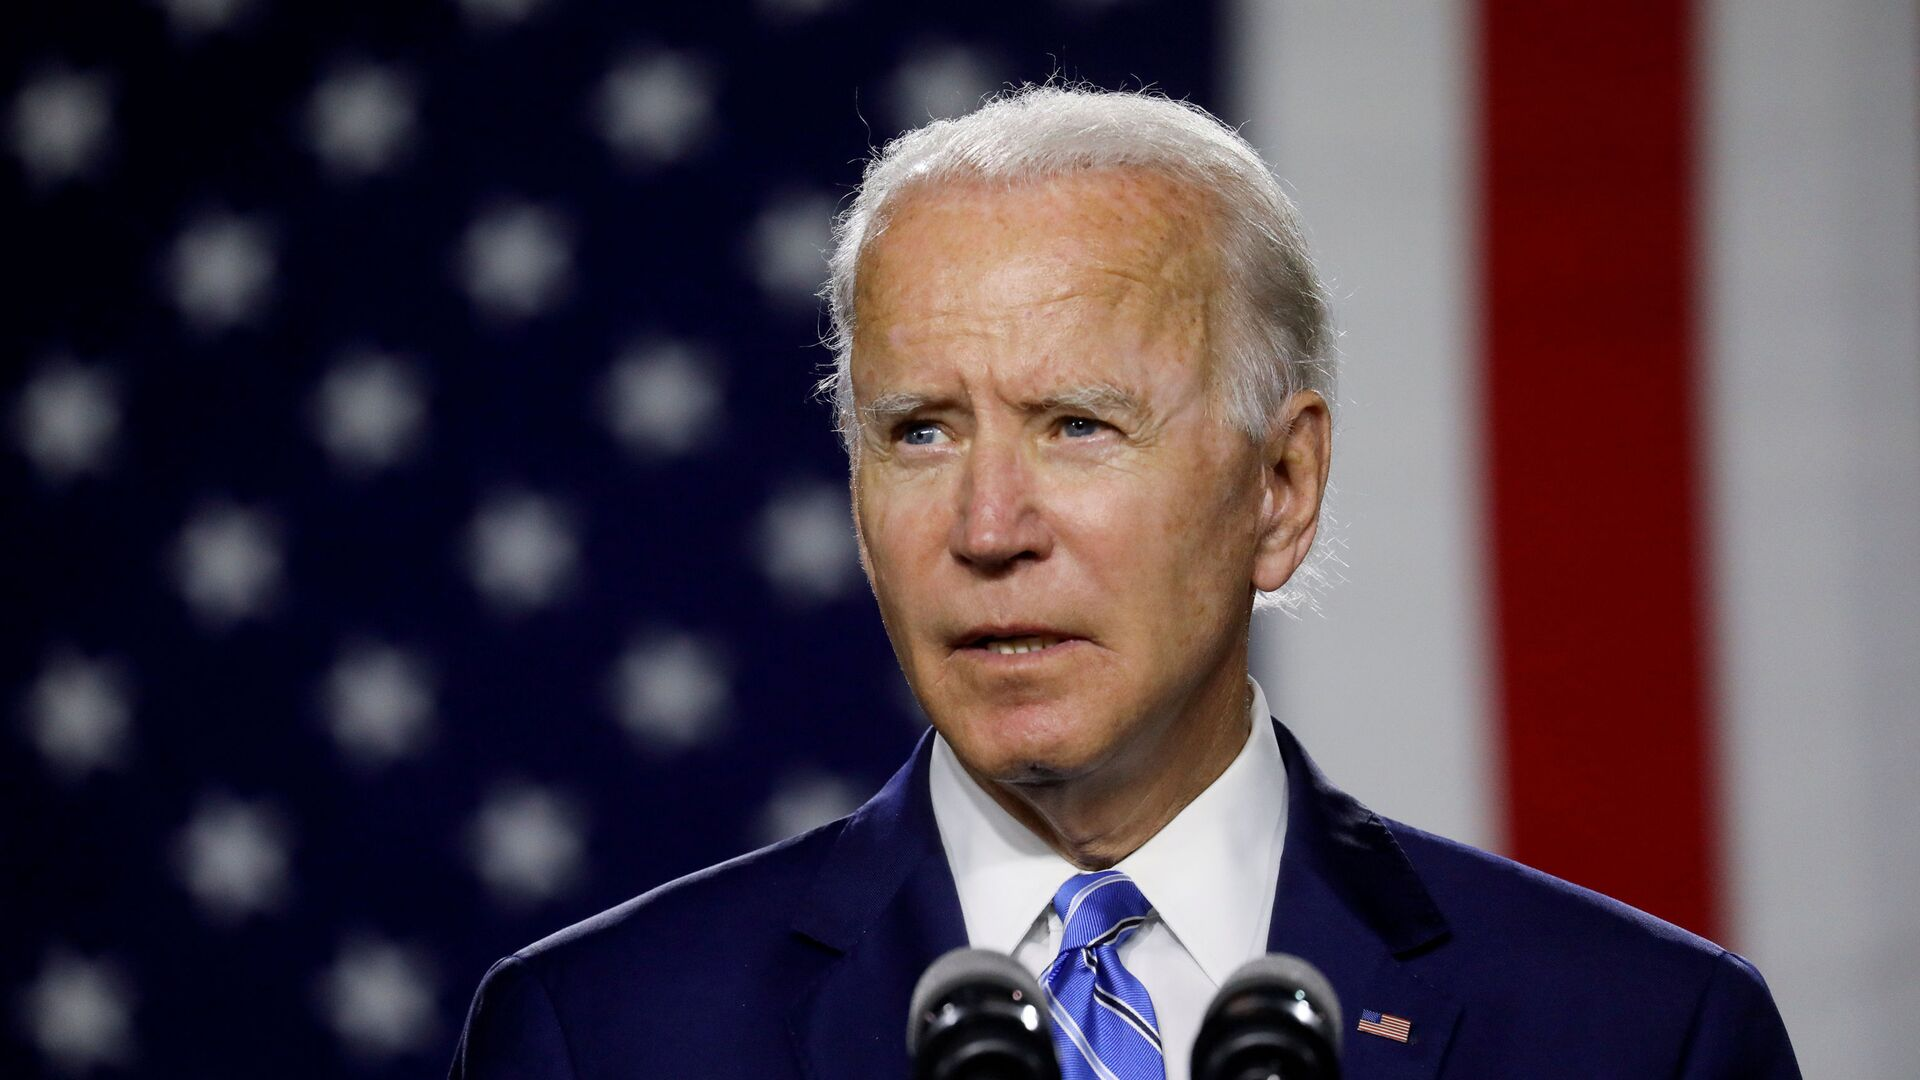 Joe Biden, presidente electo de Estados Unidos - Sputnik Mundo, 1920, 26.01.2021